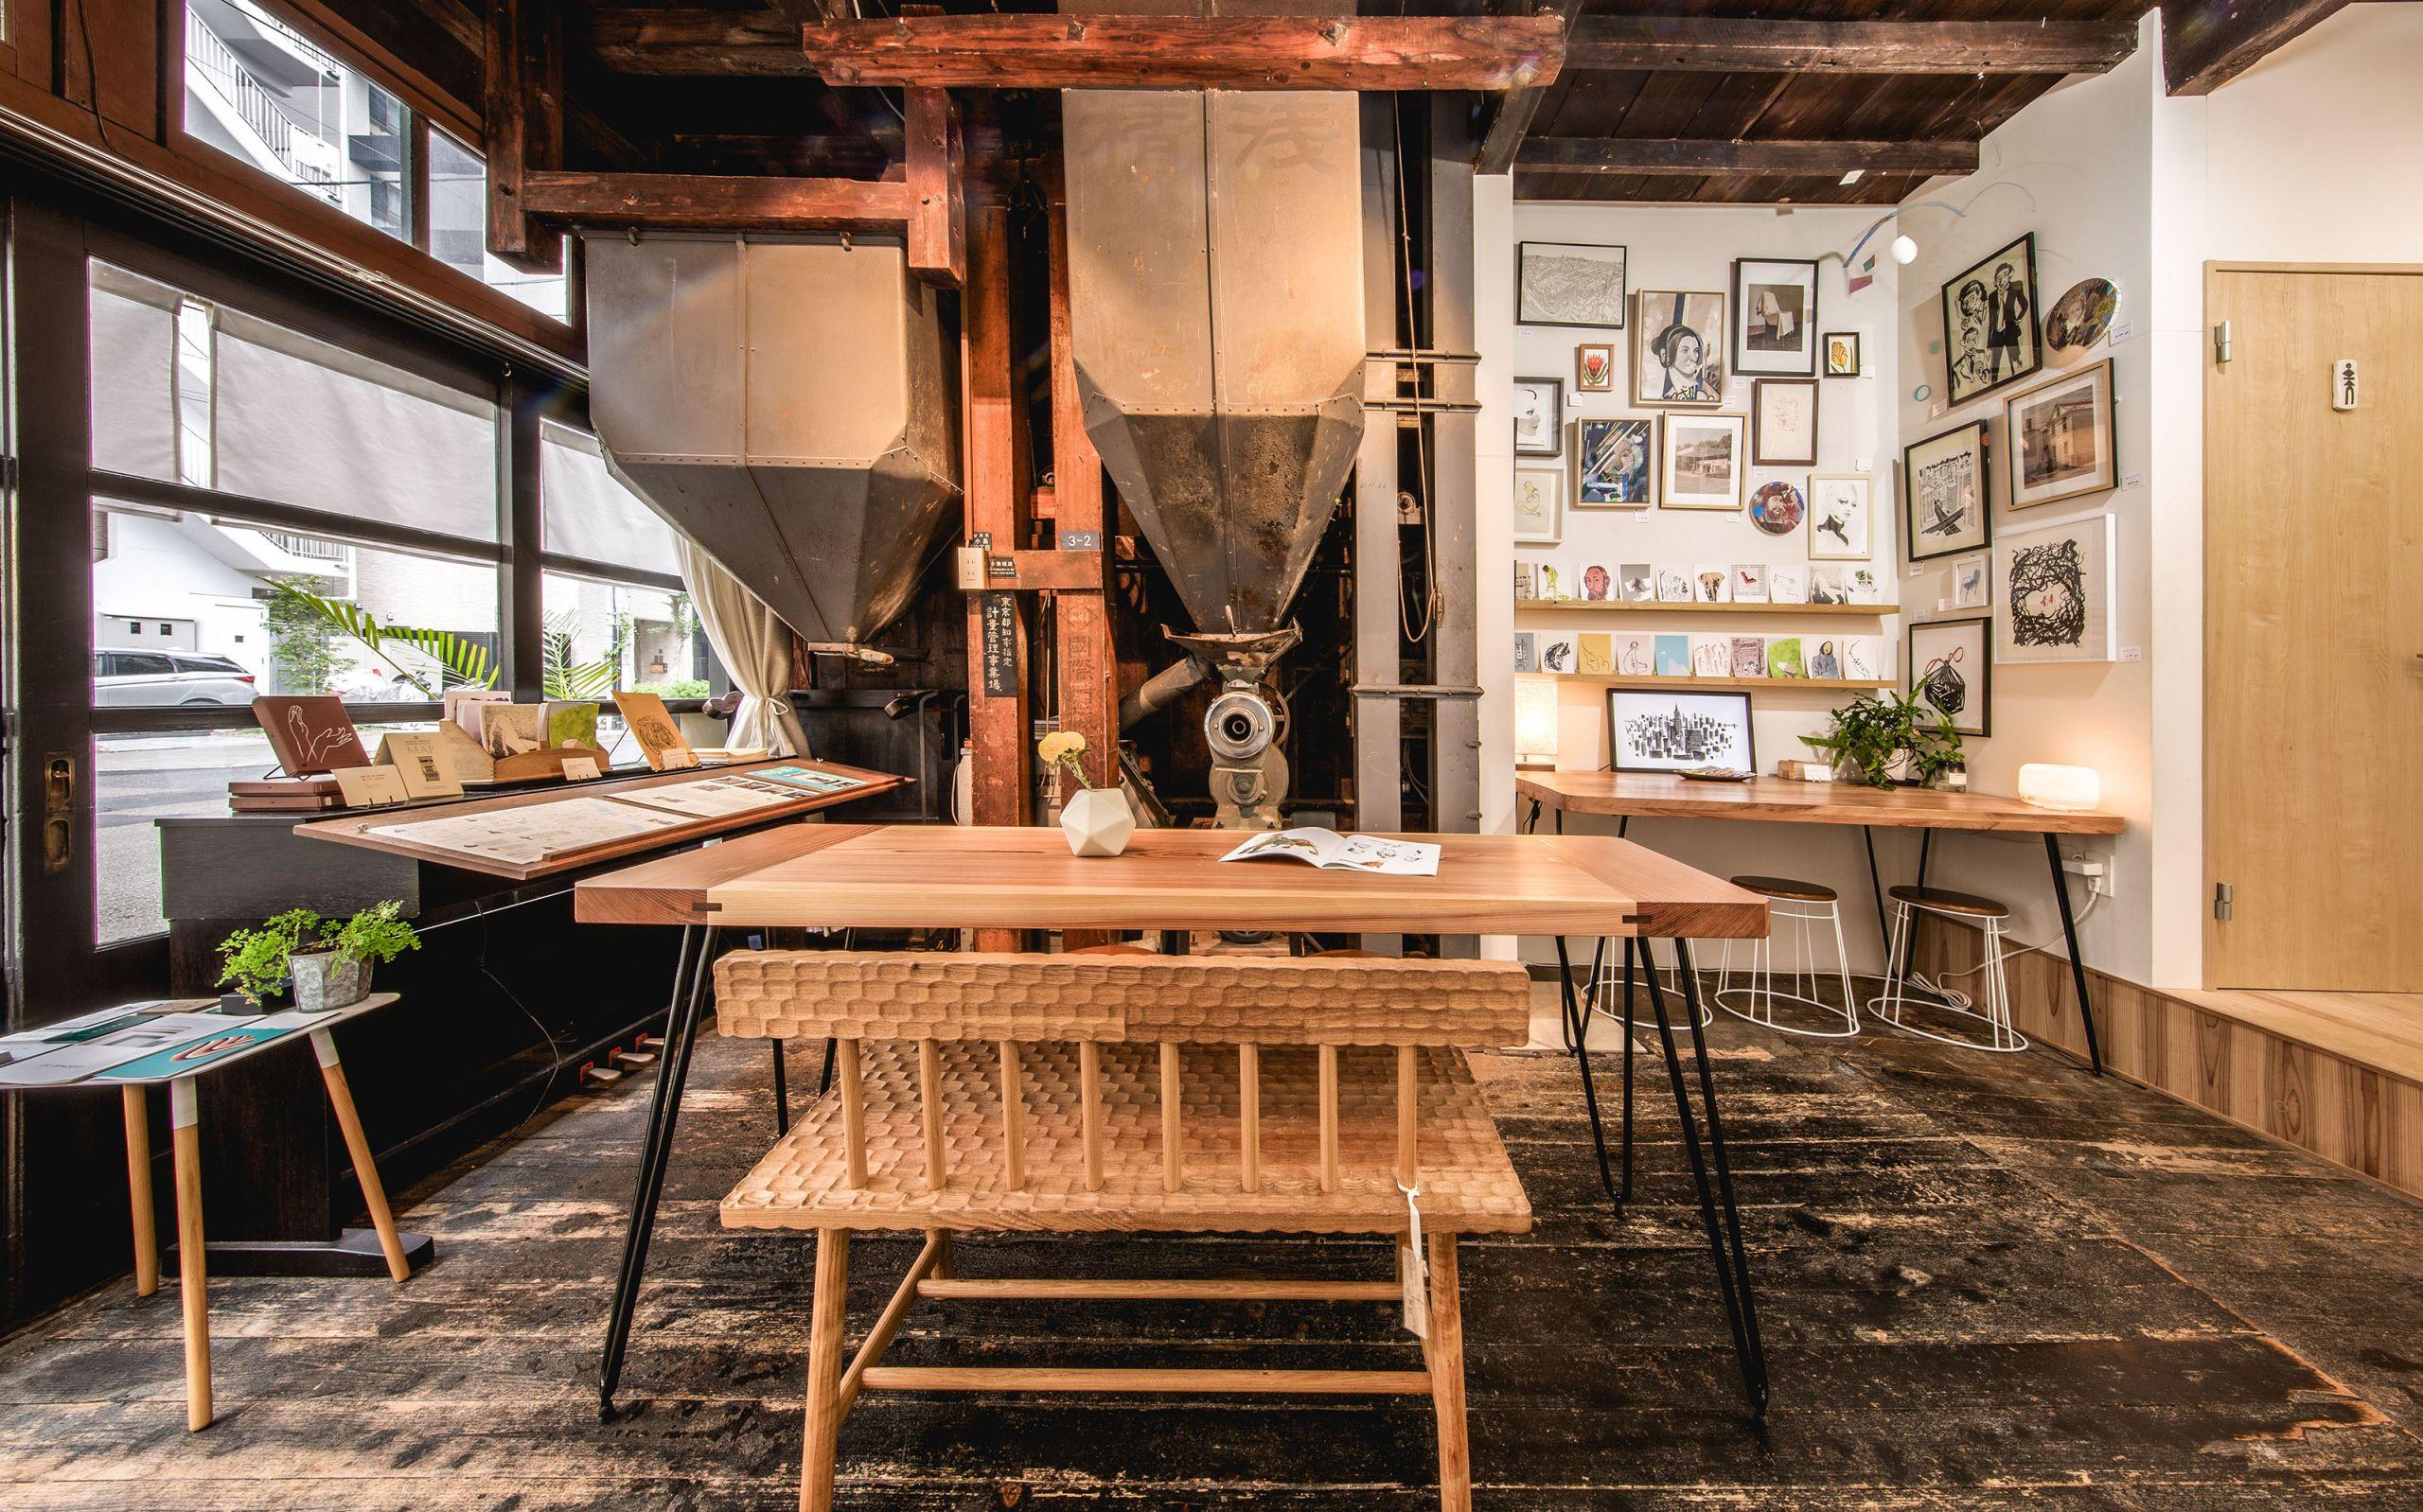 almost perfect kuramae building art residence journey into local metropolis rice factory